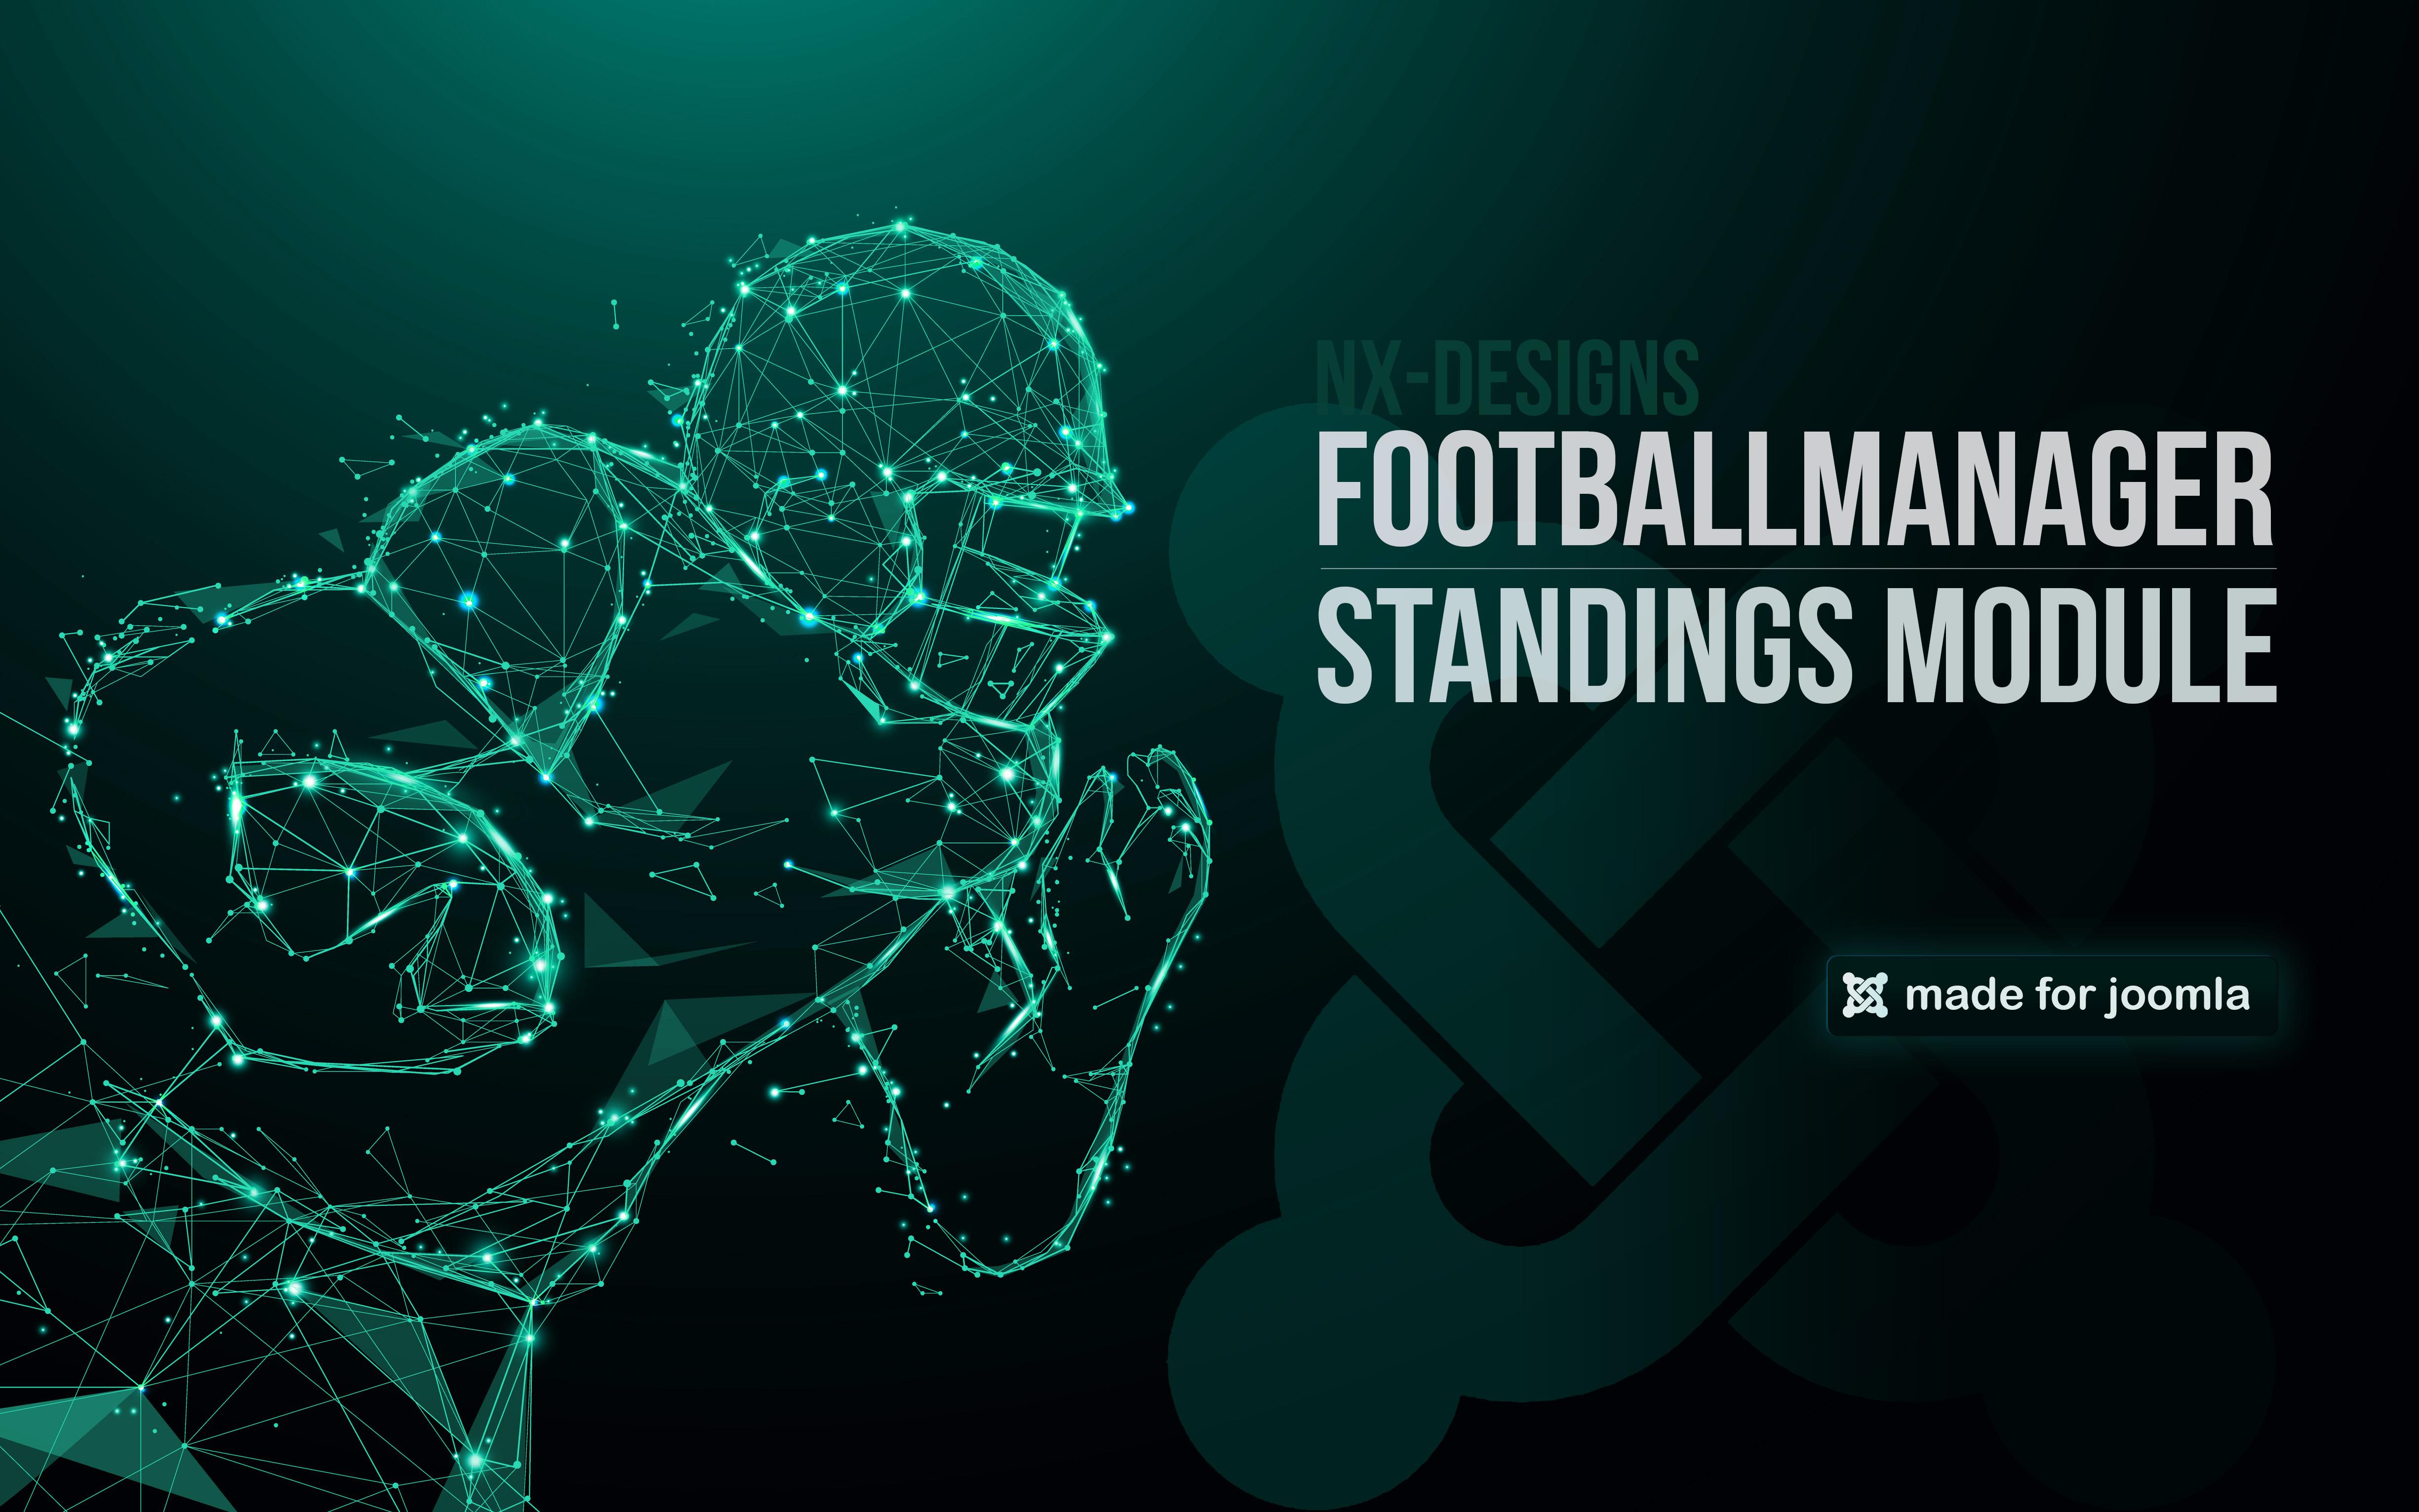 FootballManager Standings